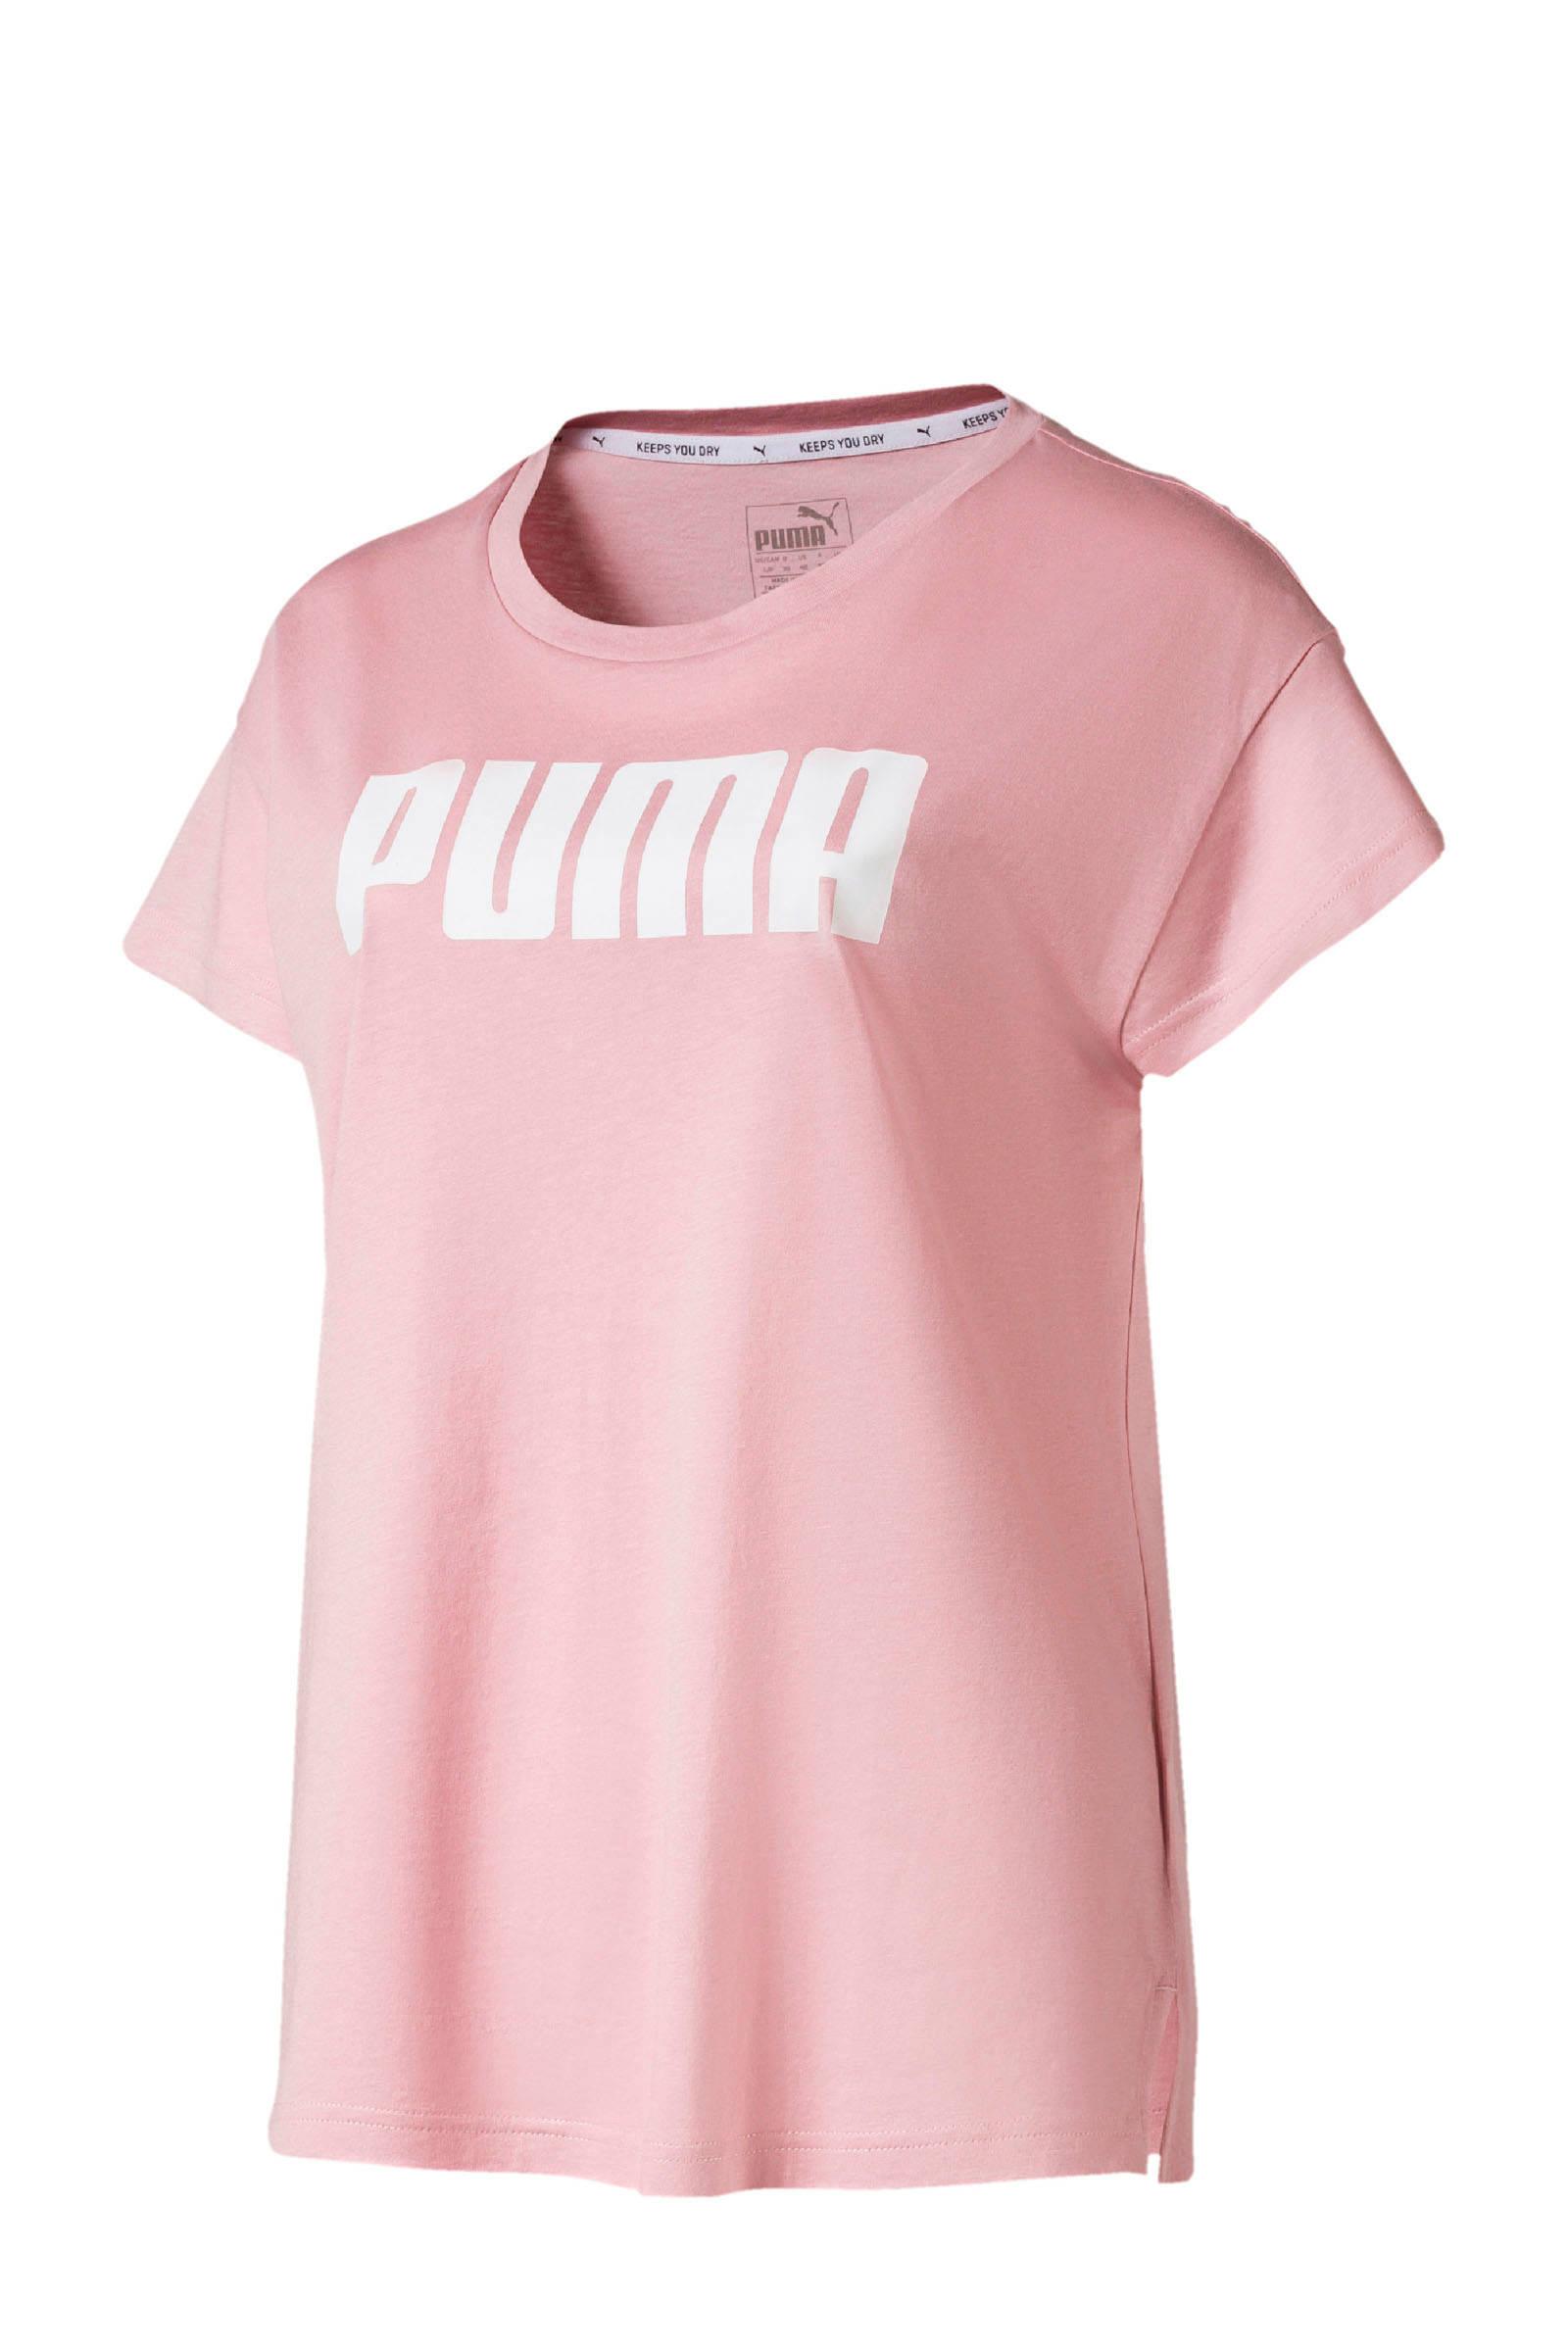 Puma T shirt oudroze | wehkamp